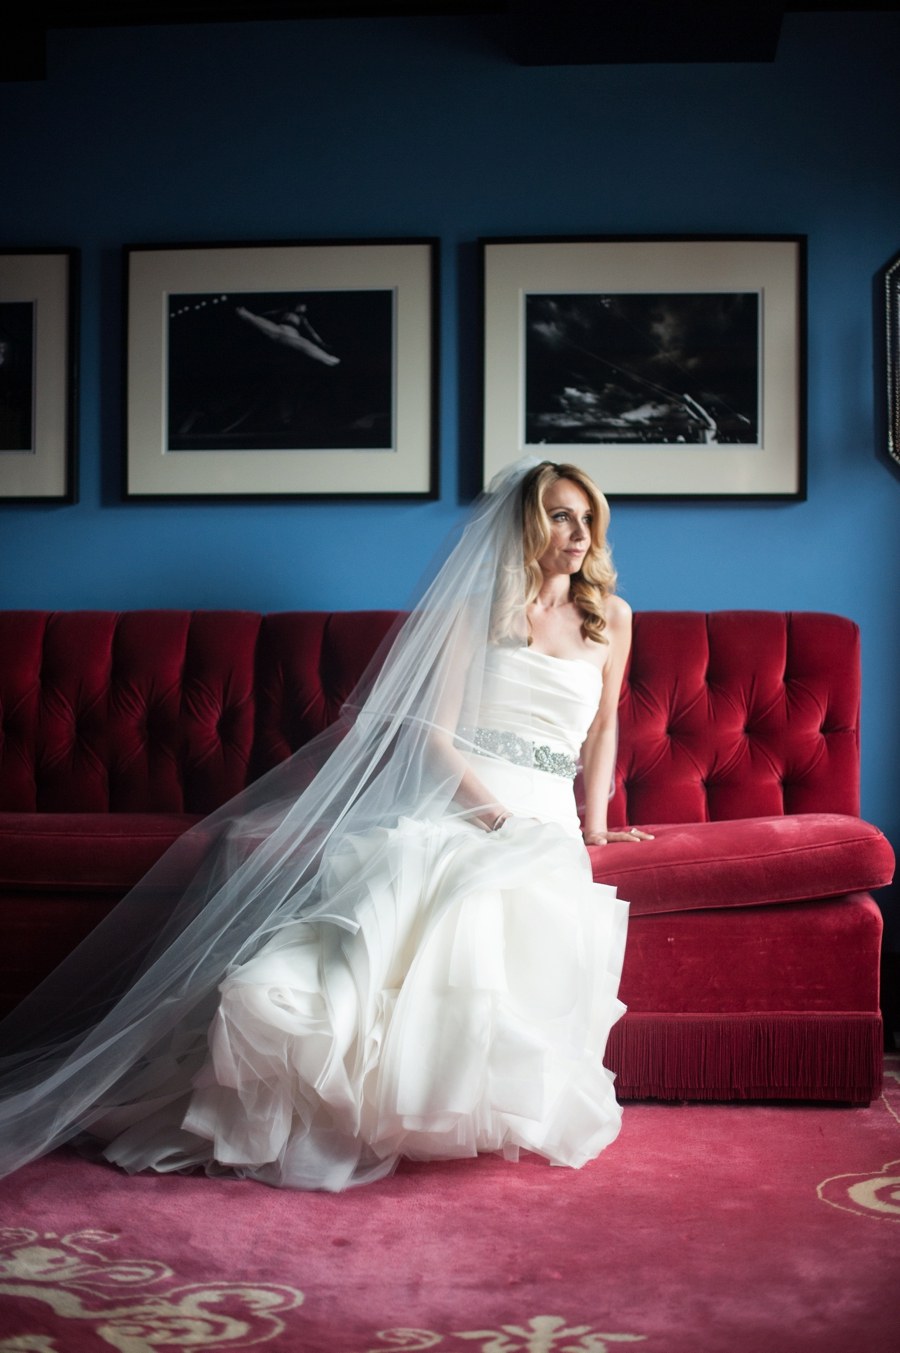 Gramercy_Park_Hotel_NYC_Wedding_MC_0022.jpg